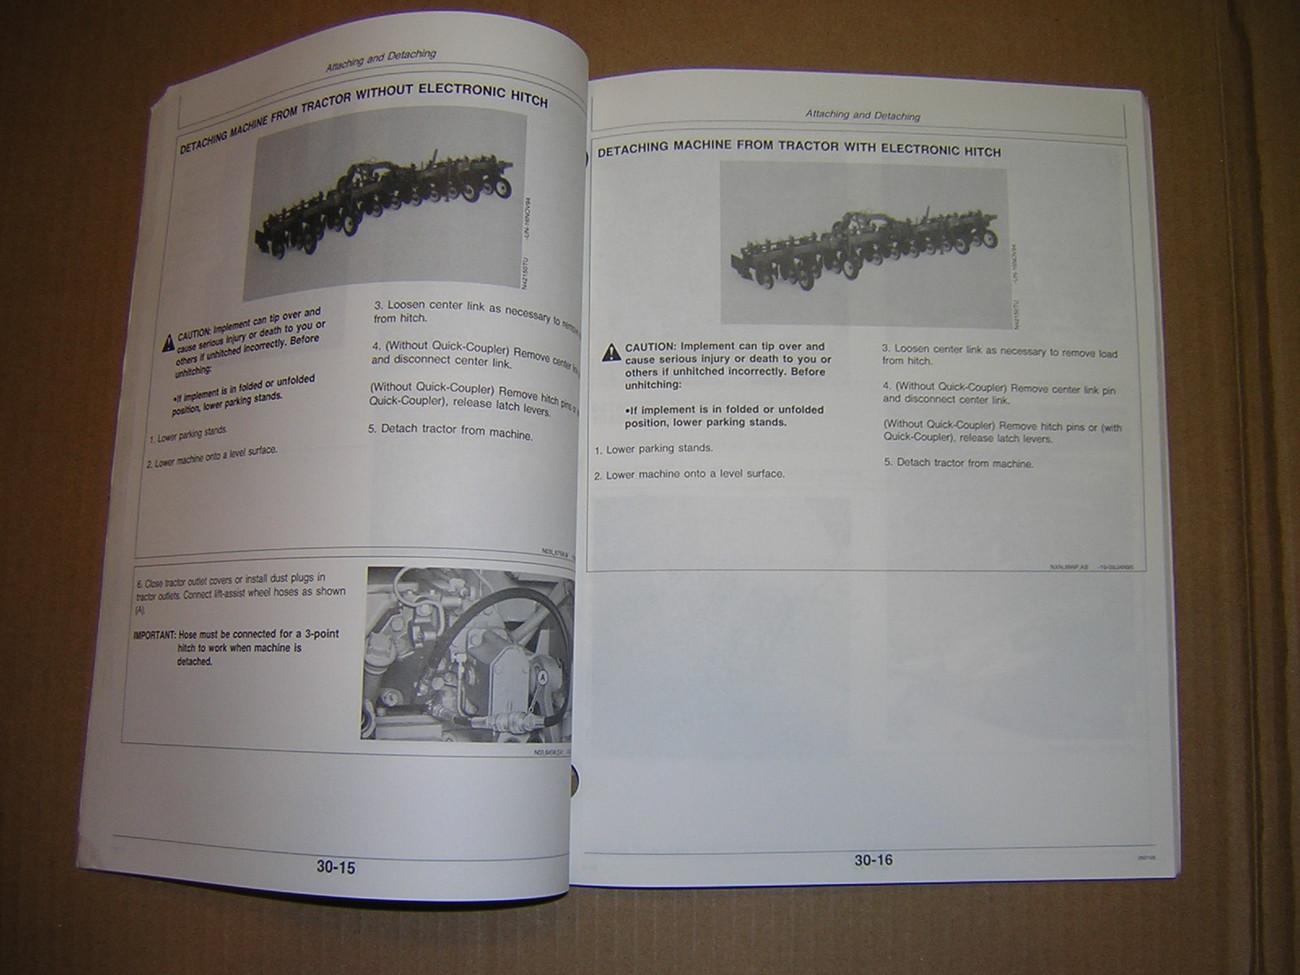 John Deere 886 Series Rear Mounted Row-Crop Cultivator Operator's Manual